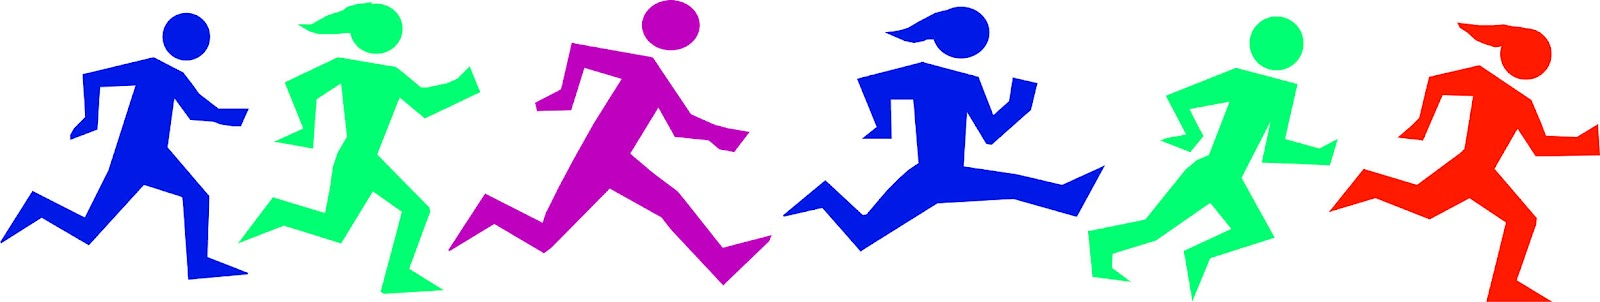 Heartland Days 5K Sign Up Deadline   KCH-Heartland Days 5K Sign Up Deadline   KCHAnews clipartall.com-9